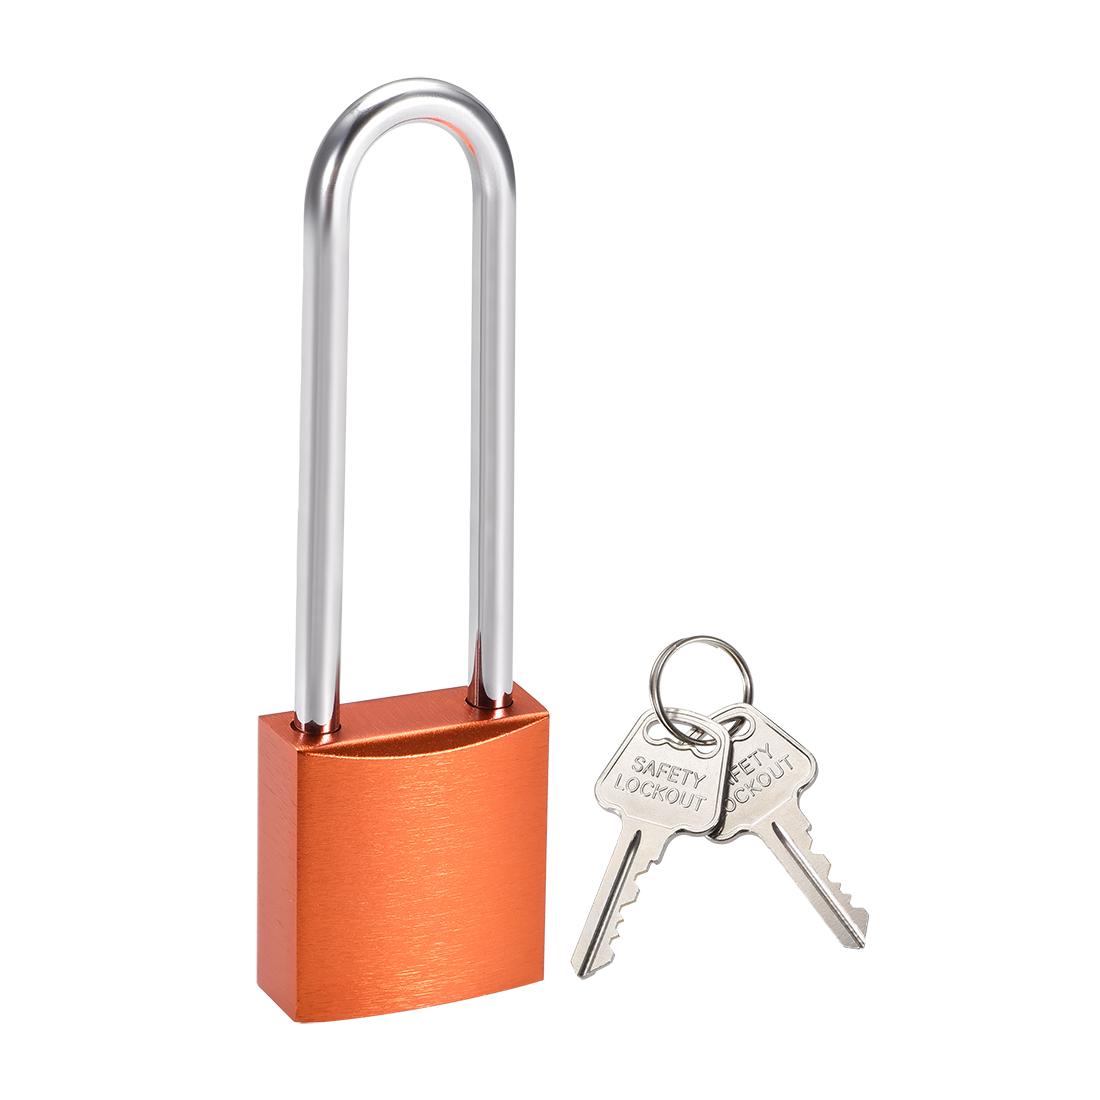 3 Inch Shackle Key Different Safety Padlock Orange